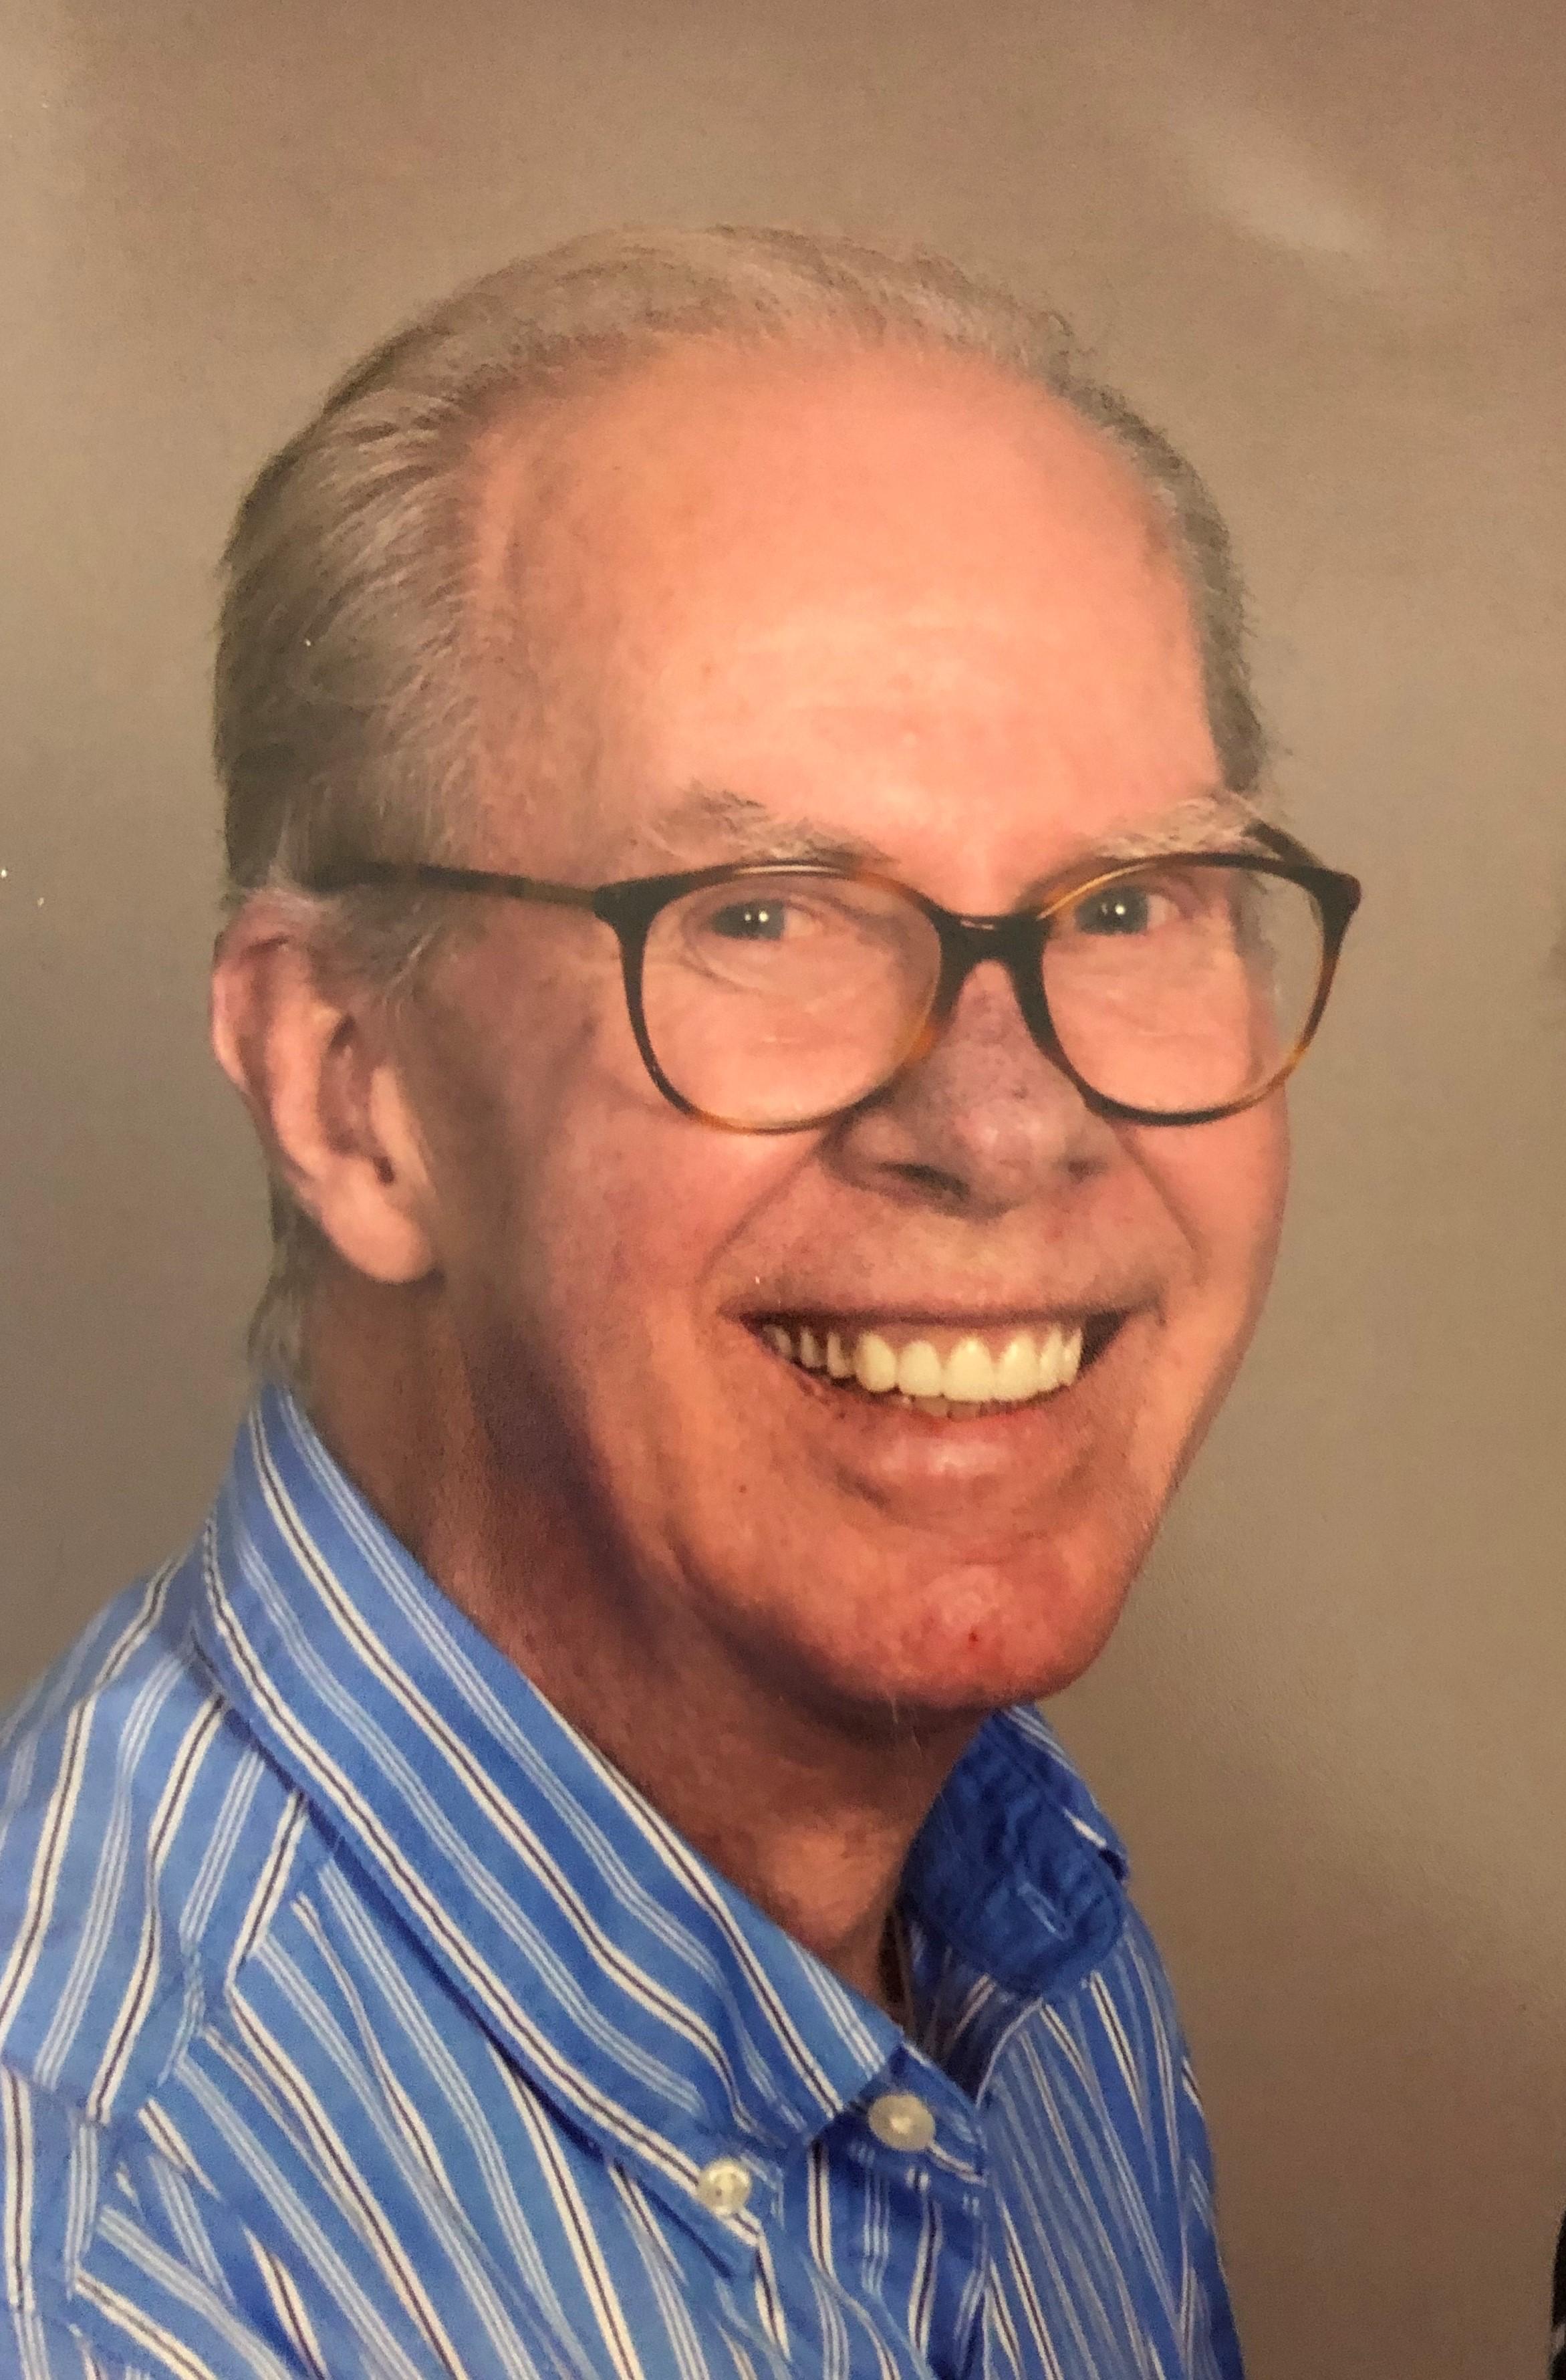 Edward C. Koehn, 73, of Monticello